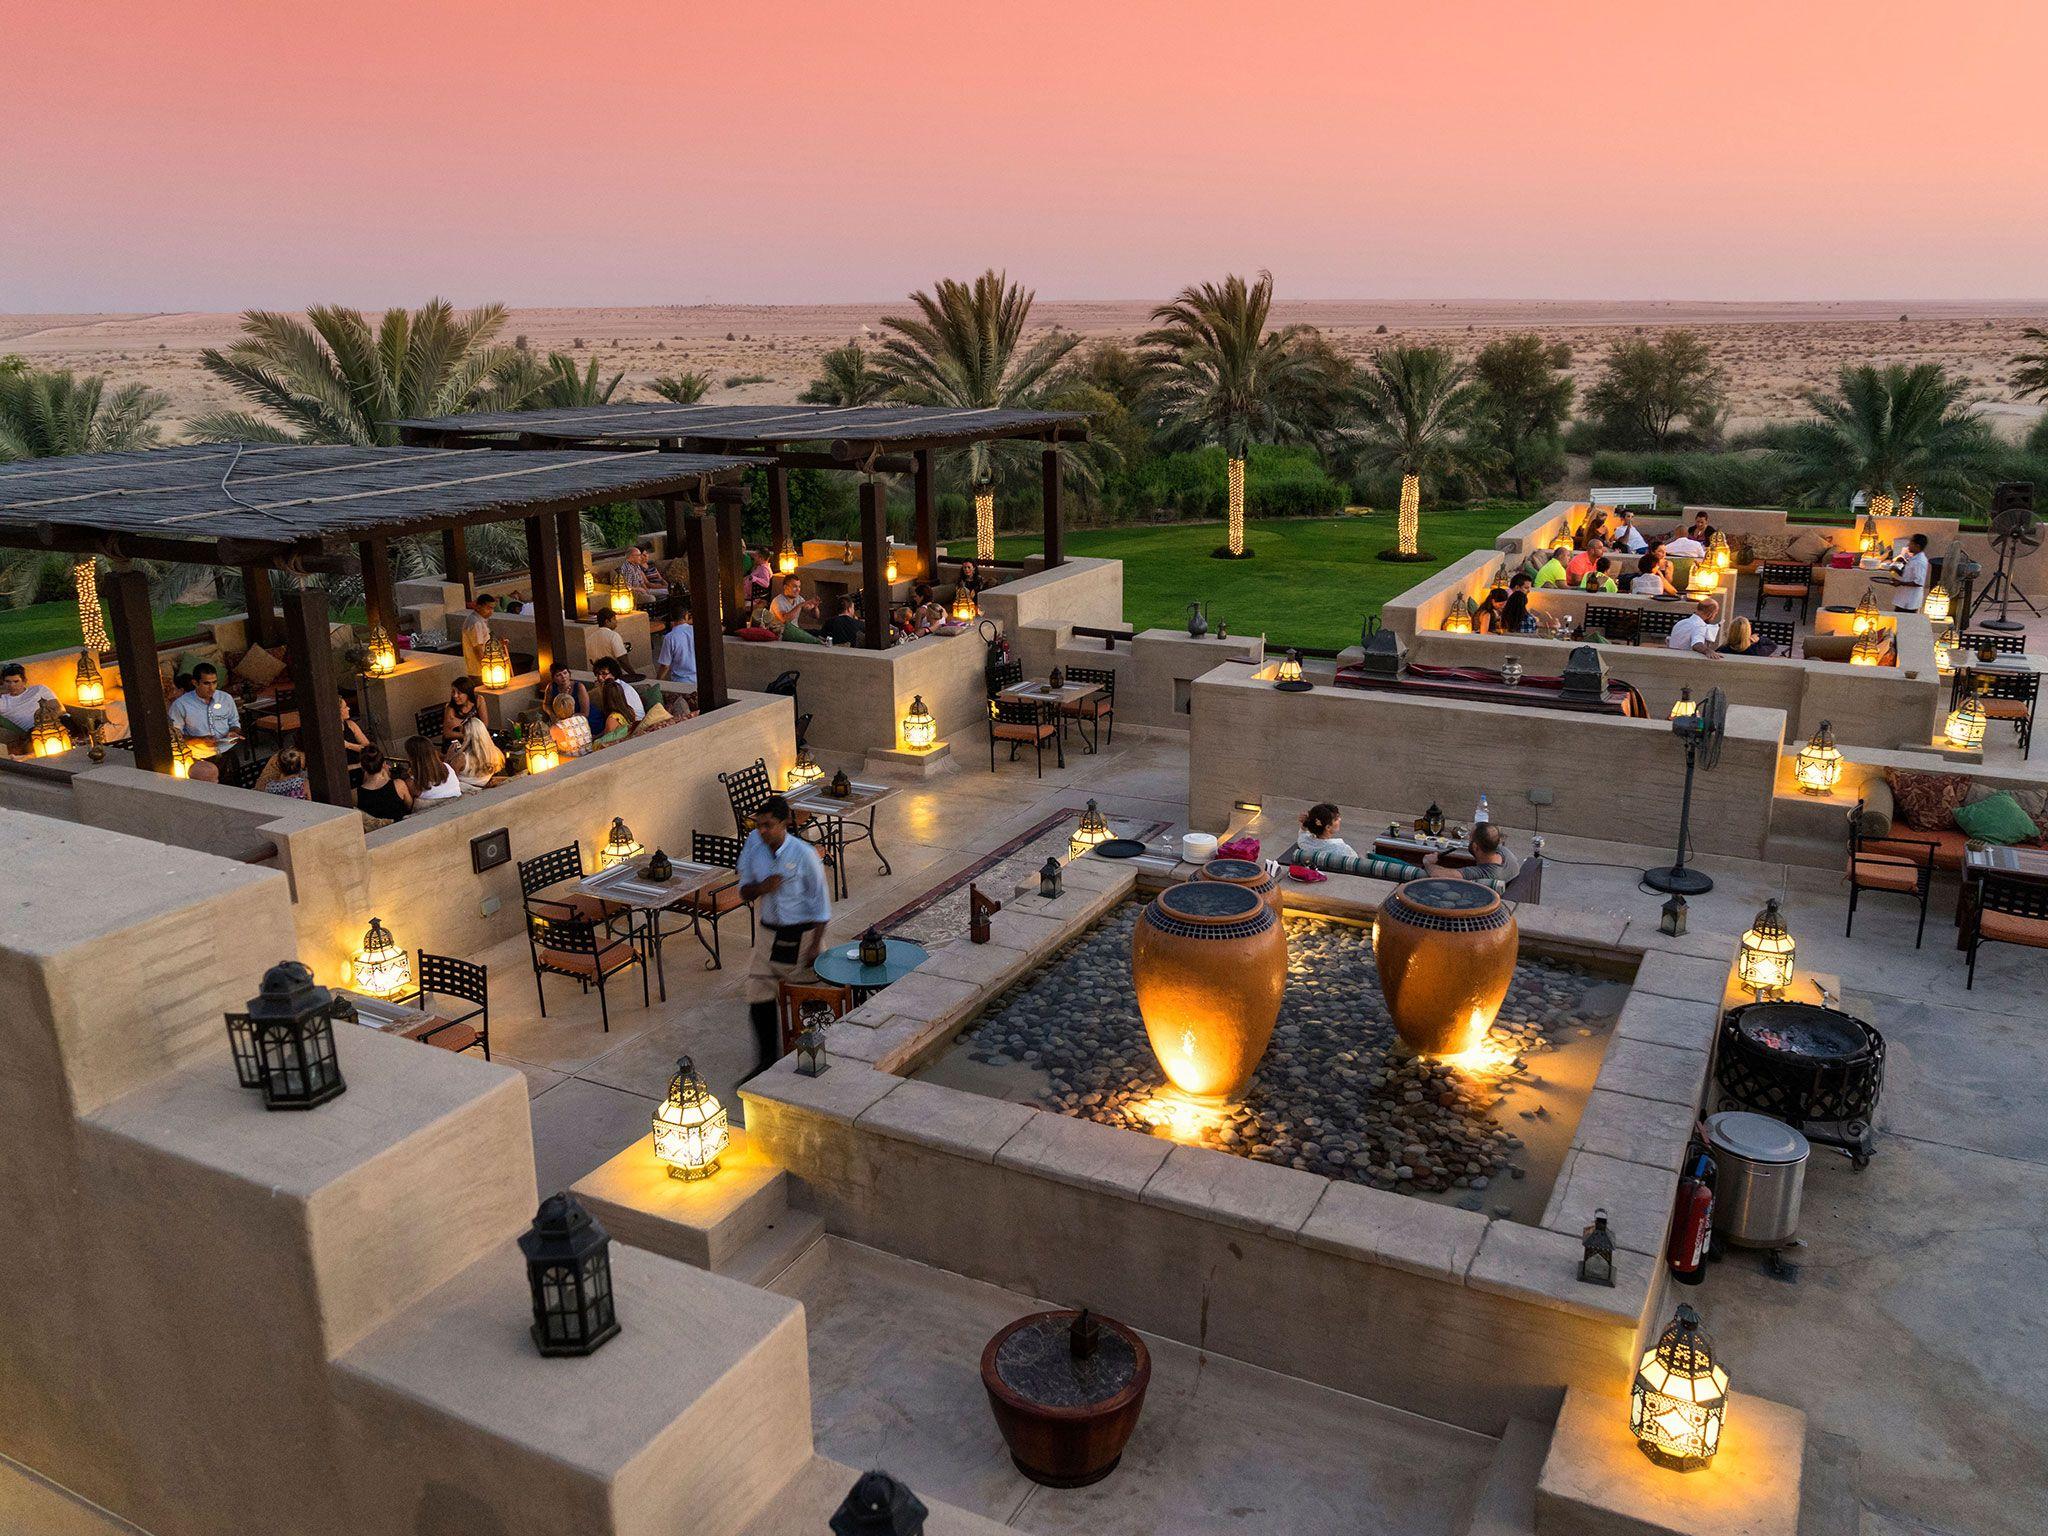 Bab Al Shams - Desert Resort & Spa - Video of Bab Al Shams ...